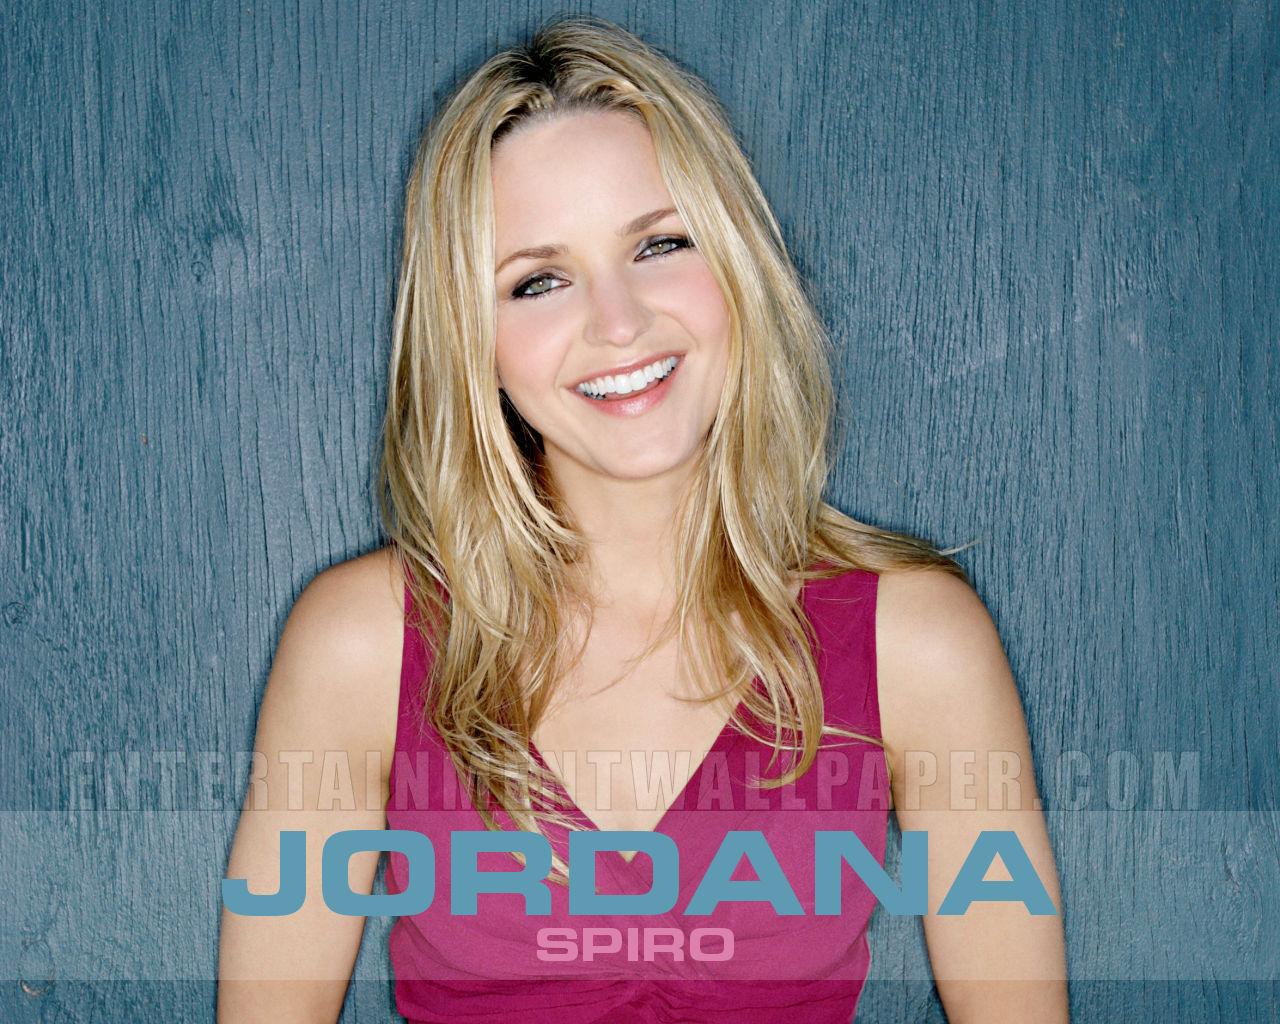 Jordana Spiro Wallpaper   60018590 1280x1024 Desktop Download 1280x1024